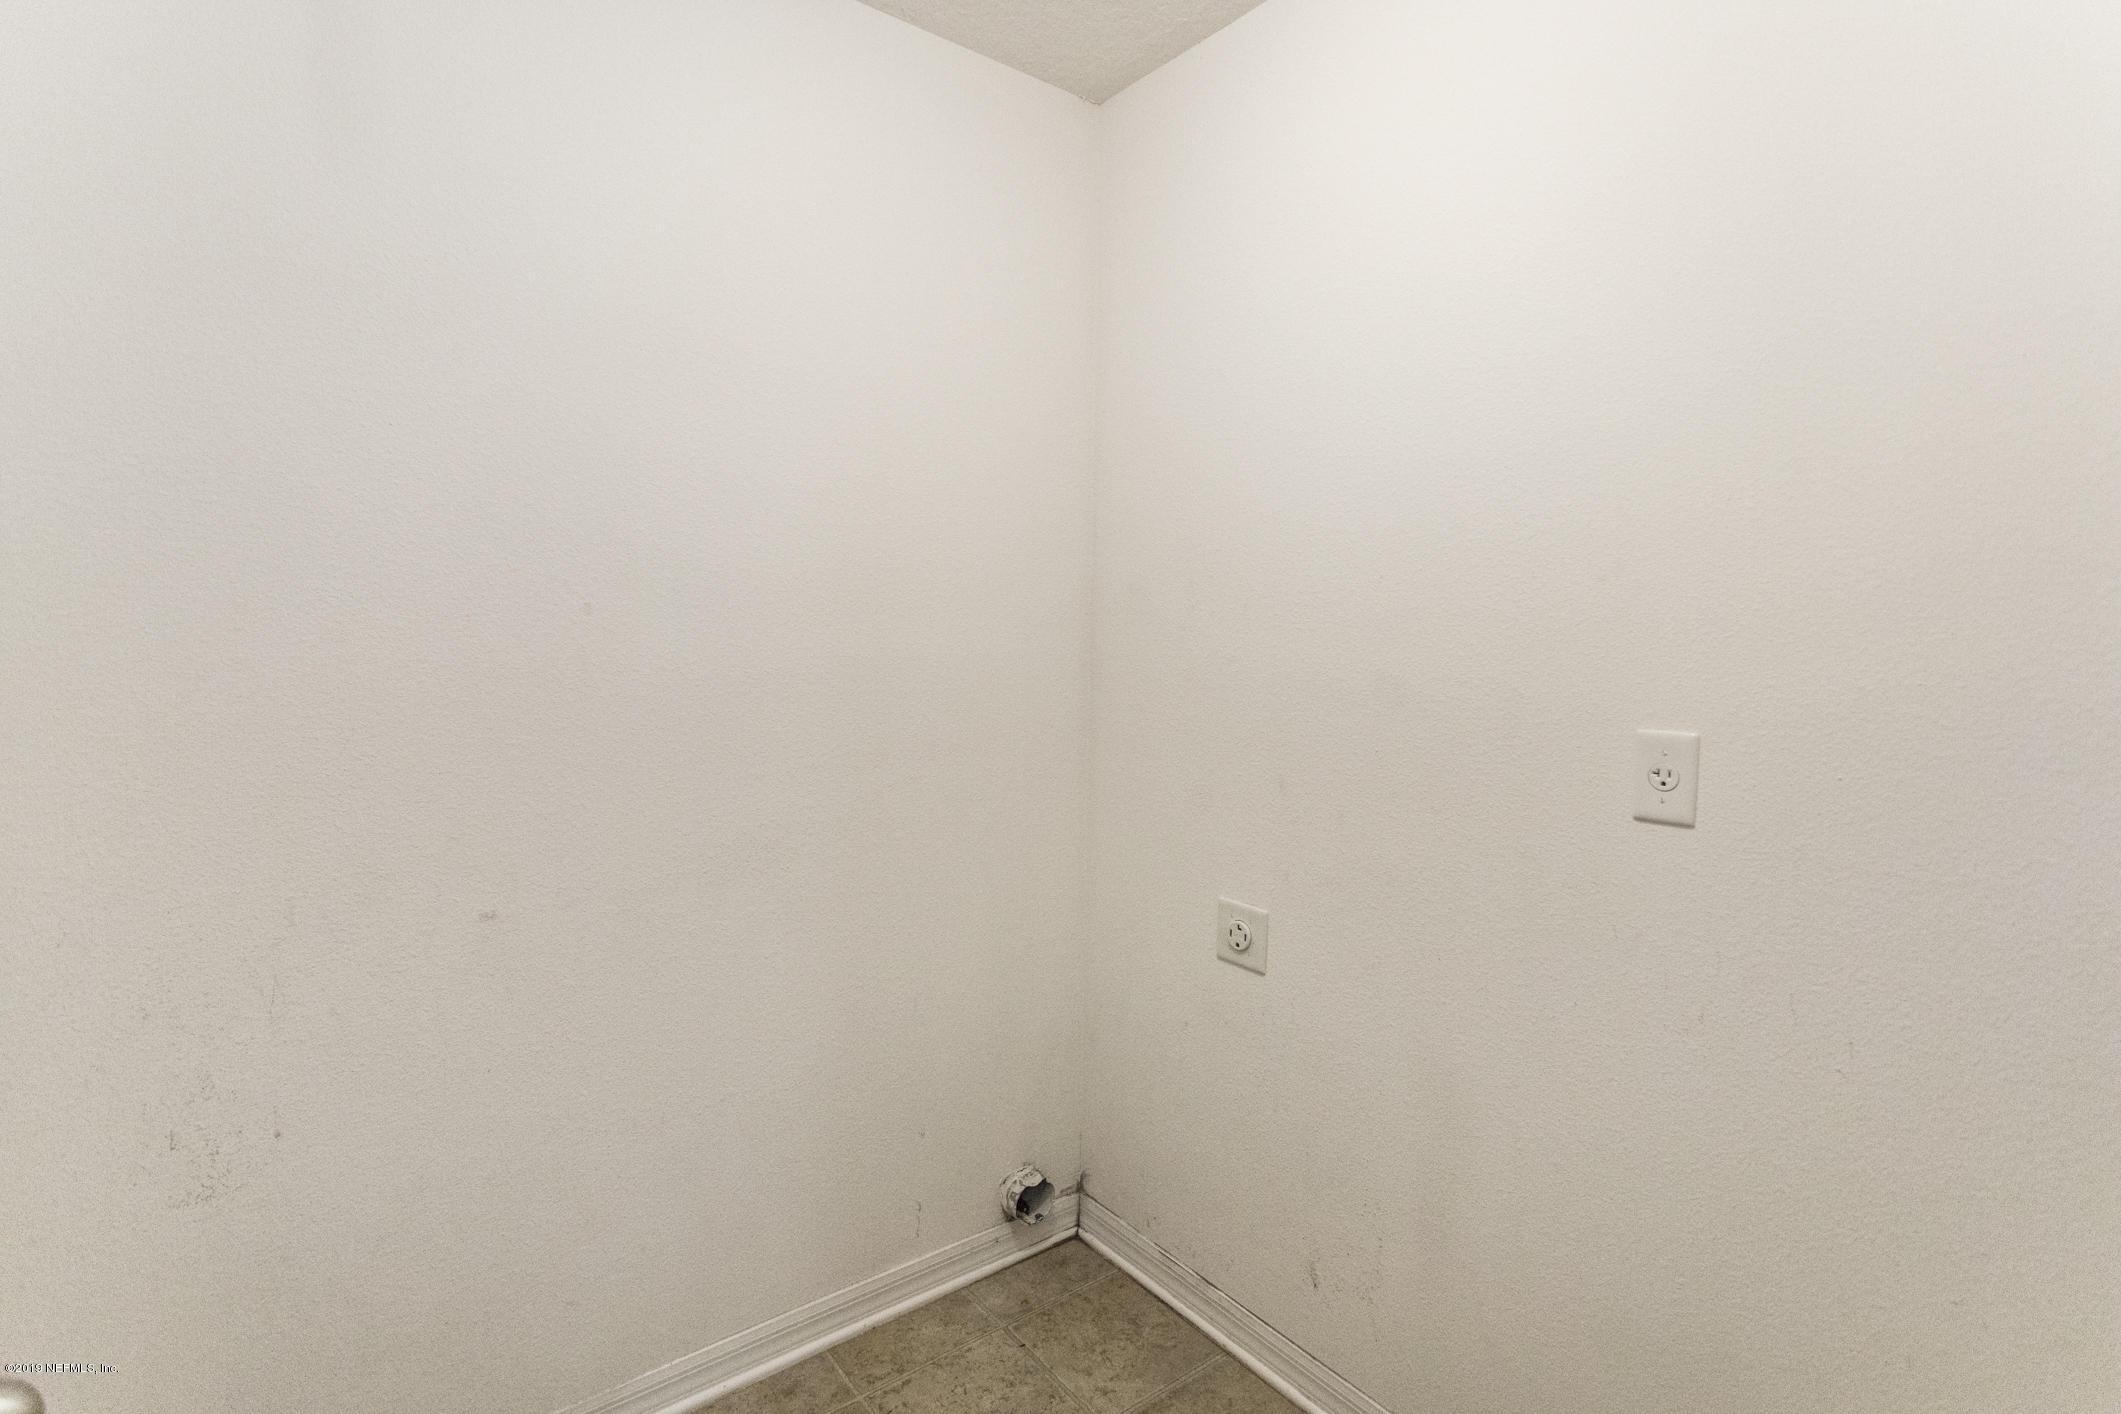 10226 MAGNOLIA HILLS, JACKSONVILLE, FLORIDA 32210, 3 Bedrooms Bedrooms, ,2 BathroomsBathrooms,Residential - single family,For sale,MAGNOLIA HILLS,984506